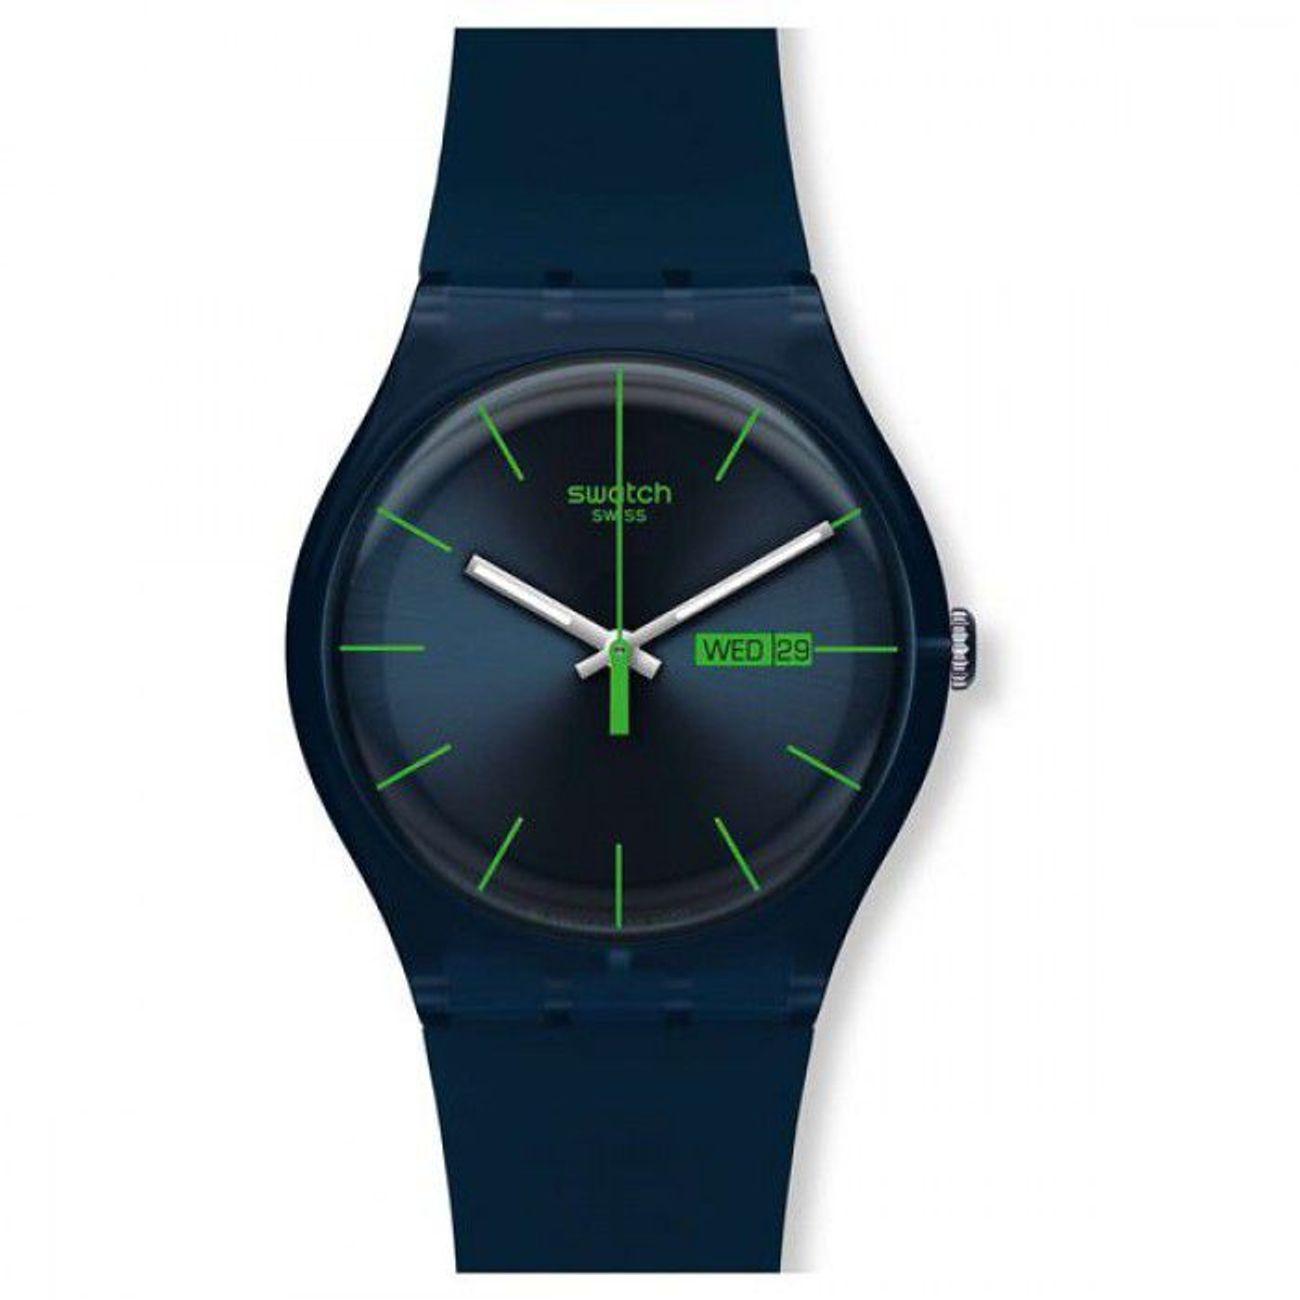 bastante agradable 62702 7ac1b Reloj Swatch Blue Rebel Hombre - Style Watch